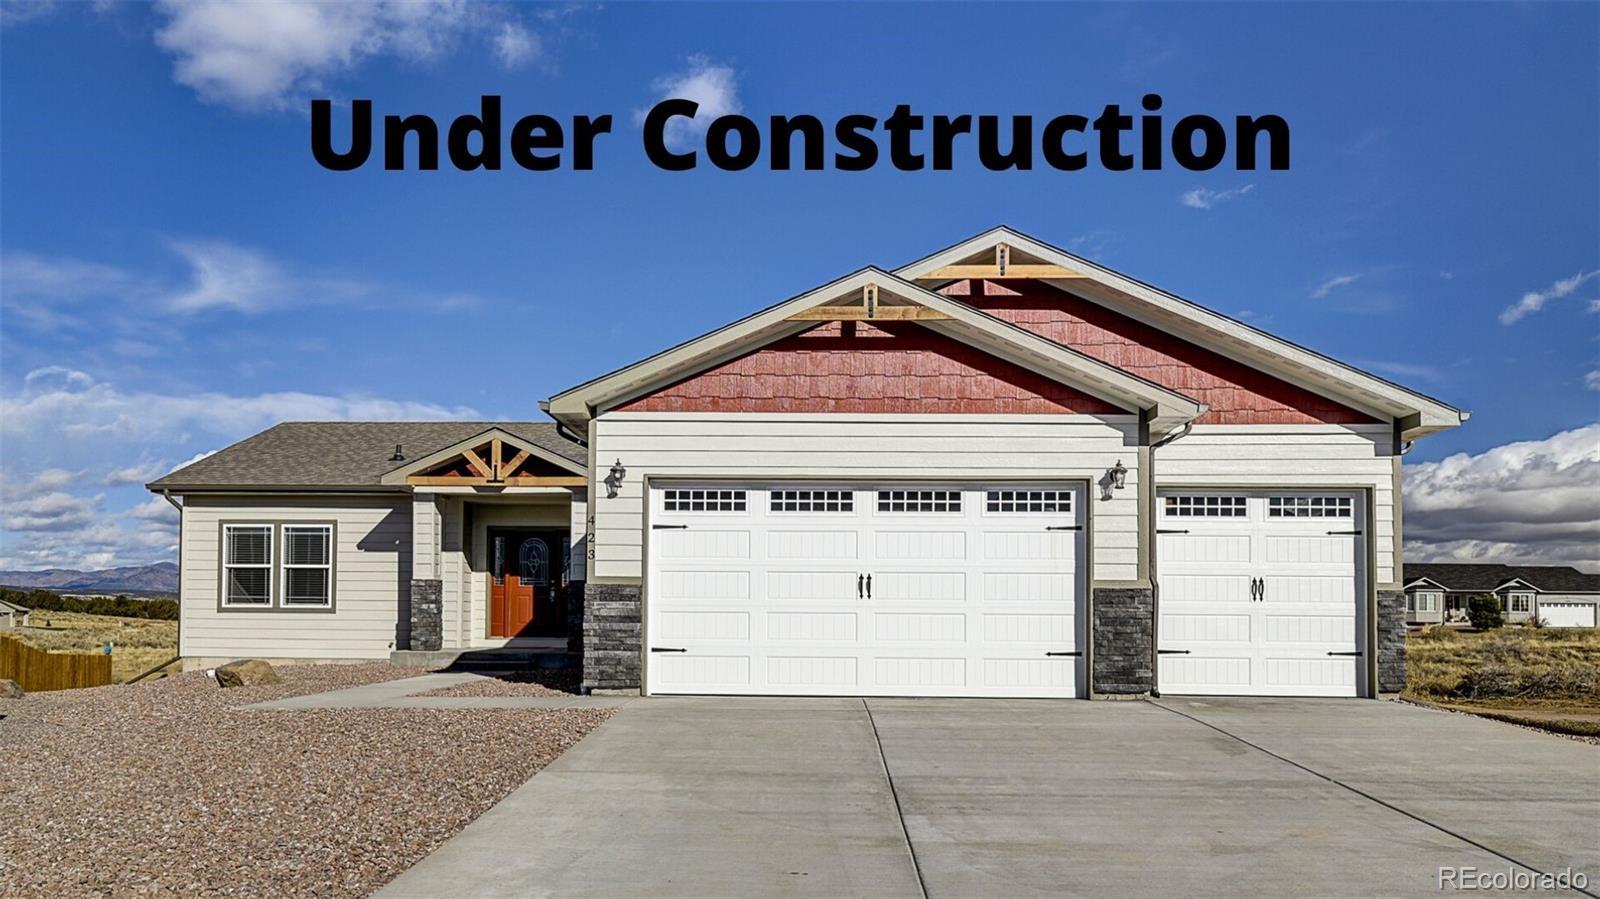 MLS# 7338899 - 1 - 964 Purcell Place, Pueblo West, CO 81007